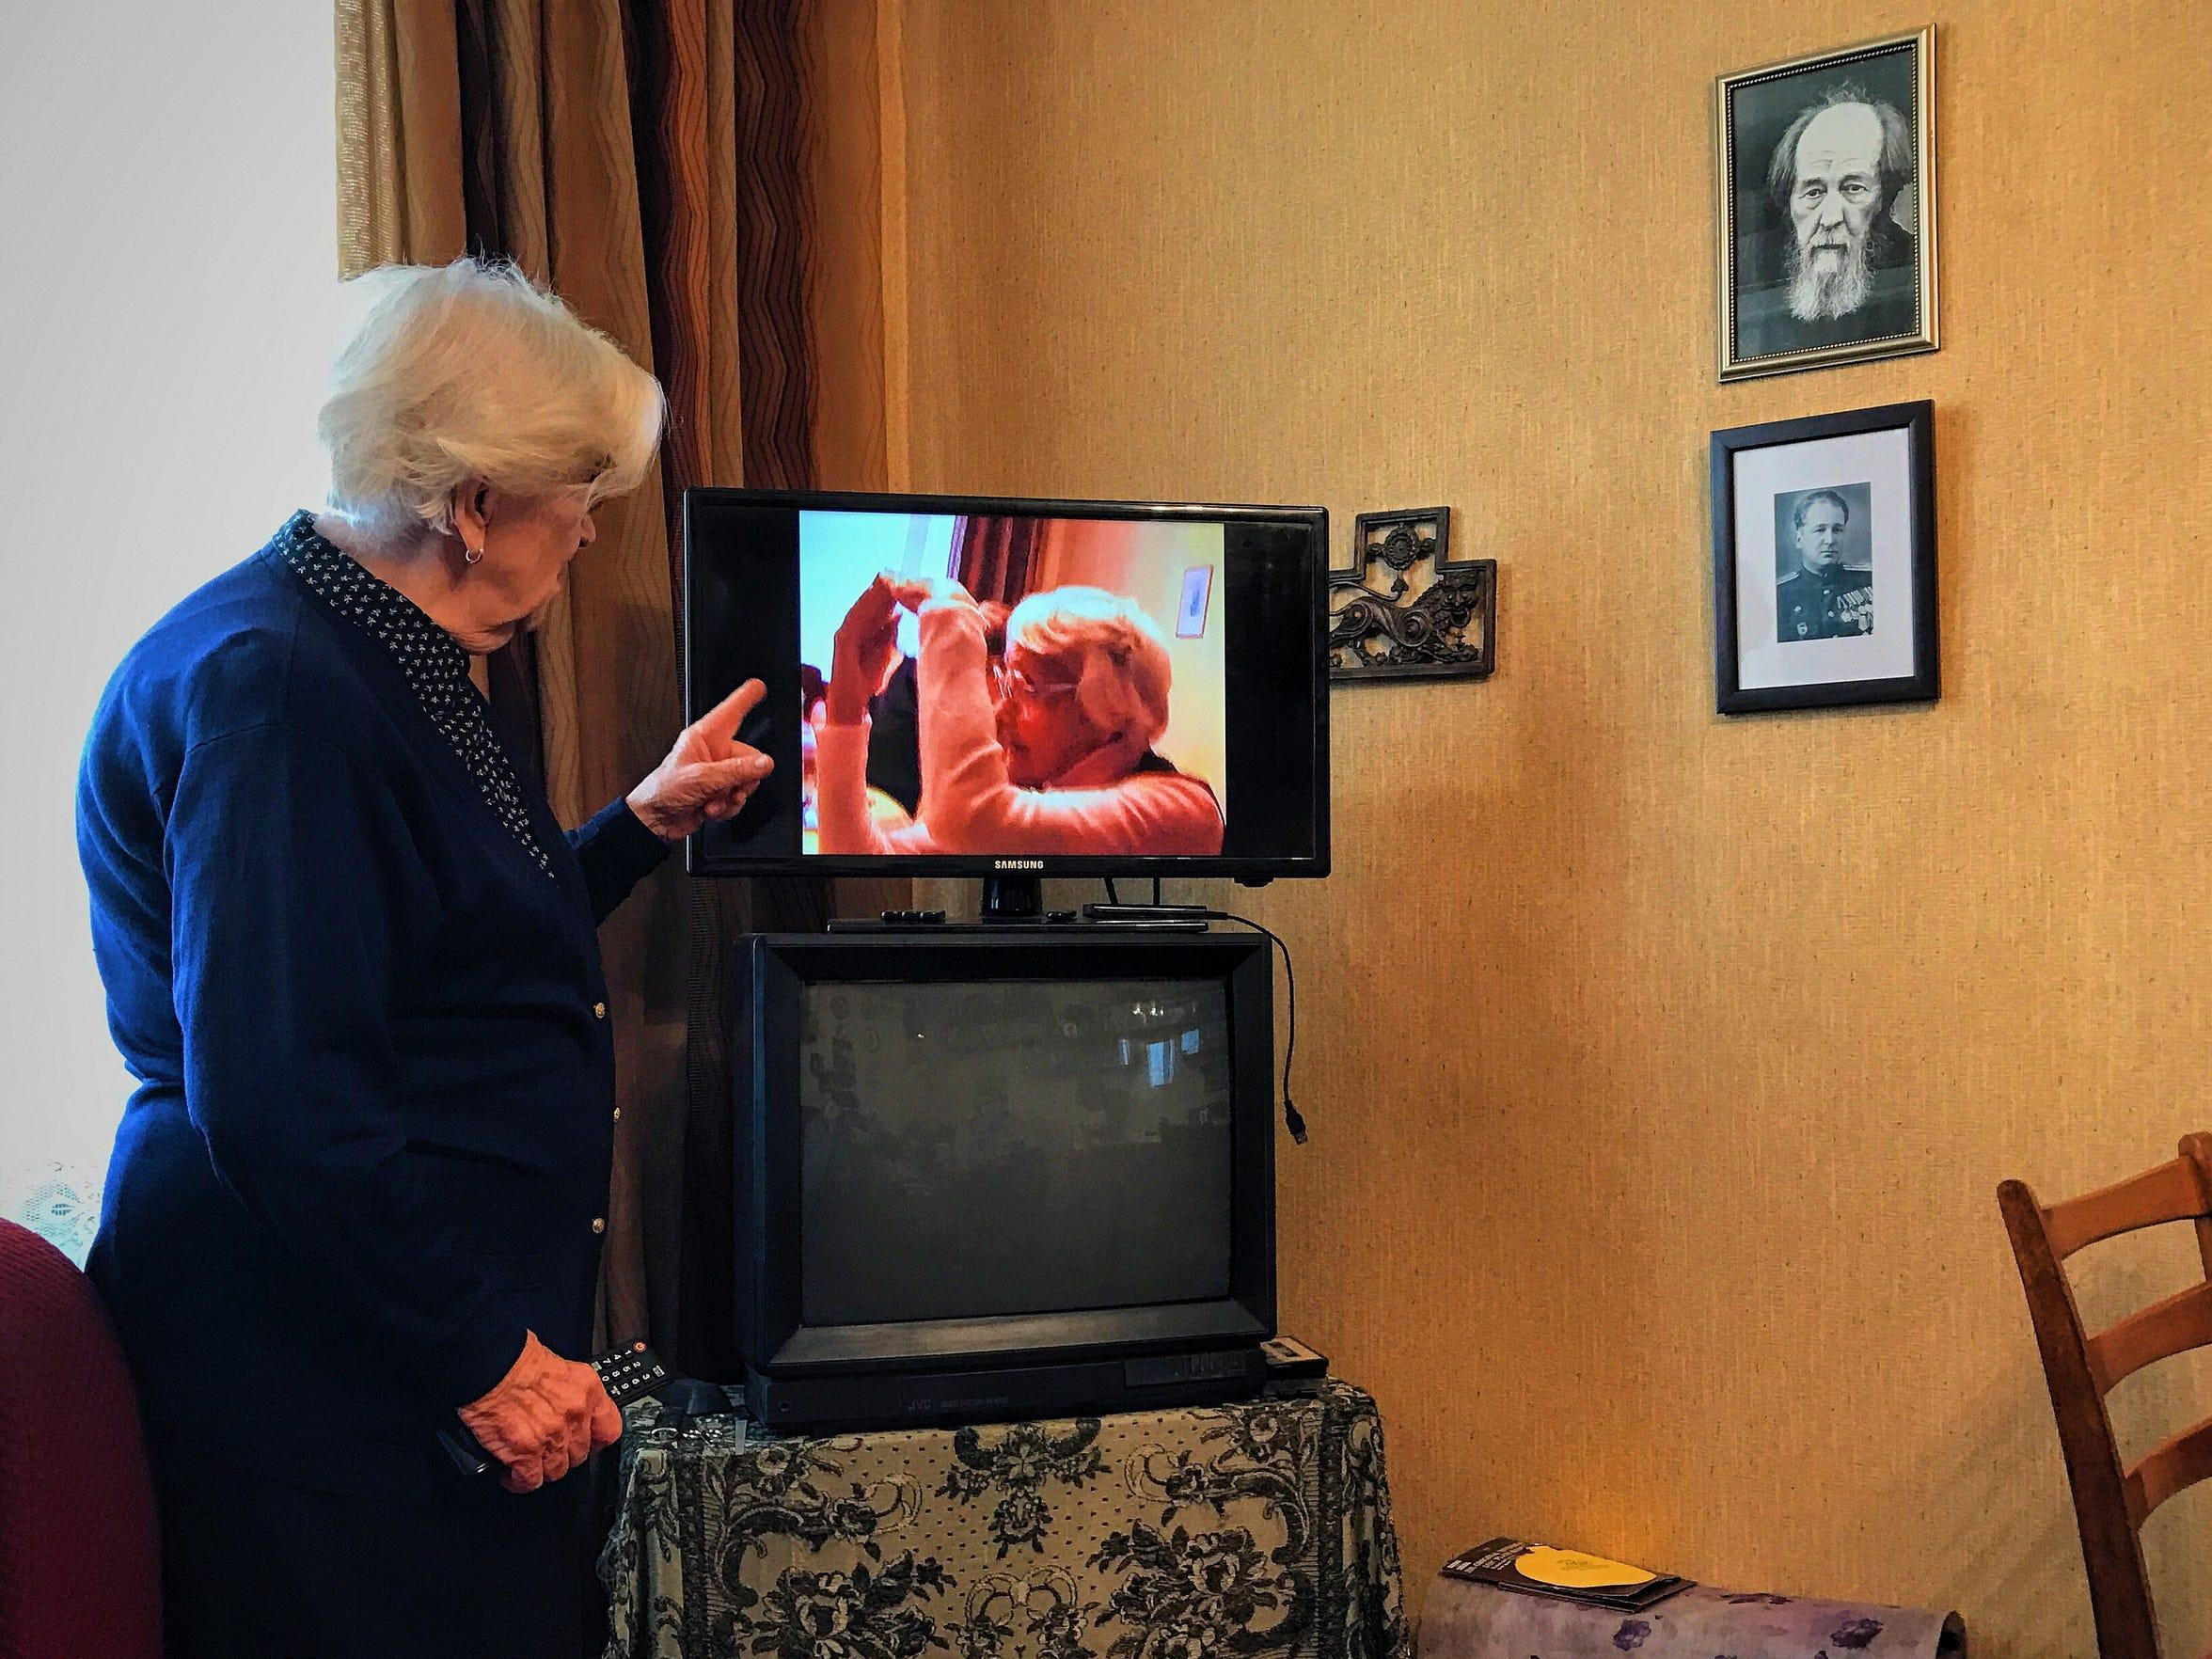 Lyudmila Alekseevna Khachatryan shows a video in her